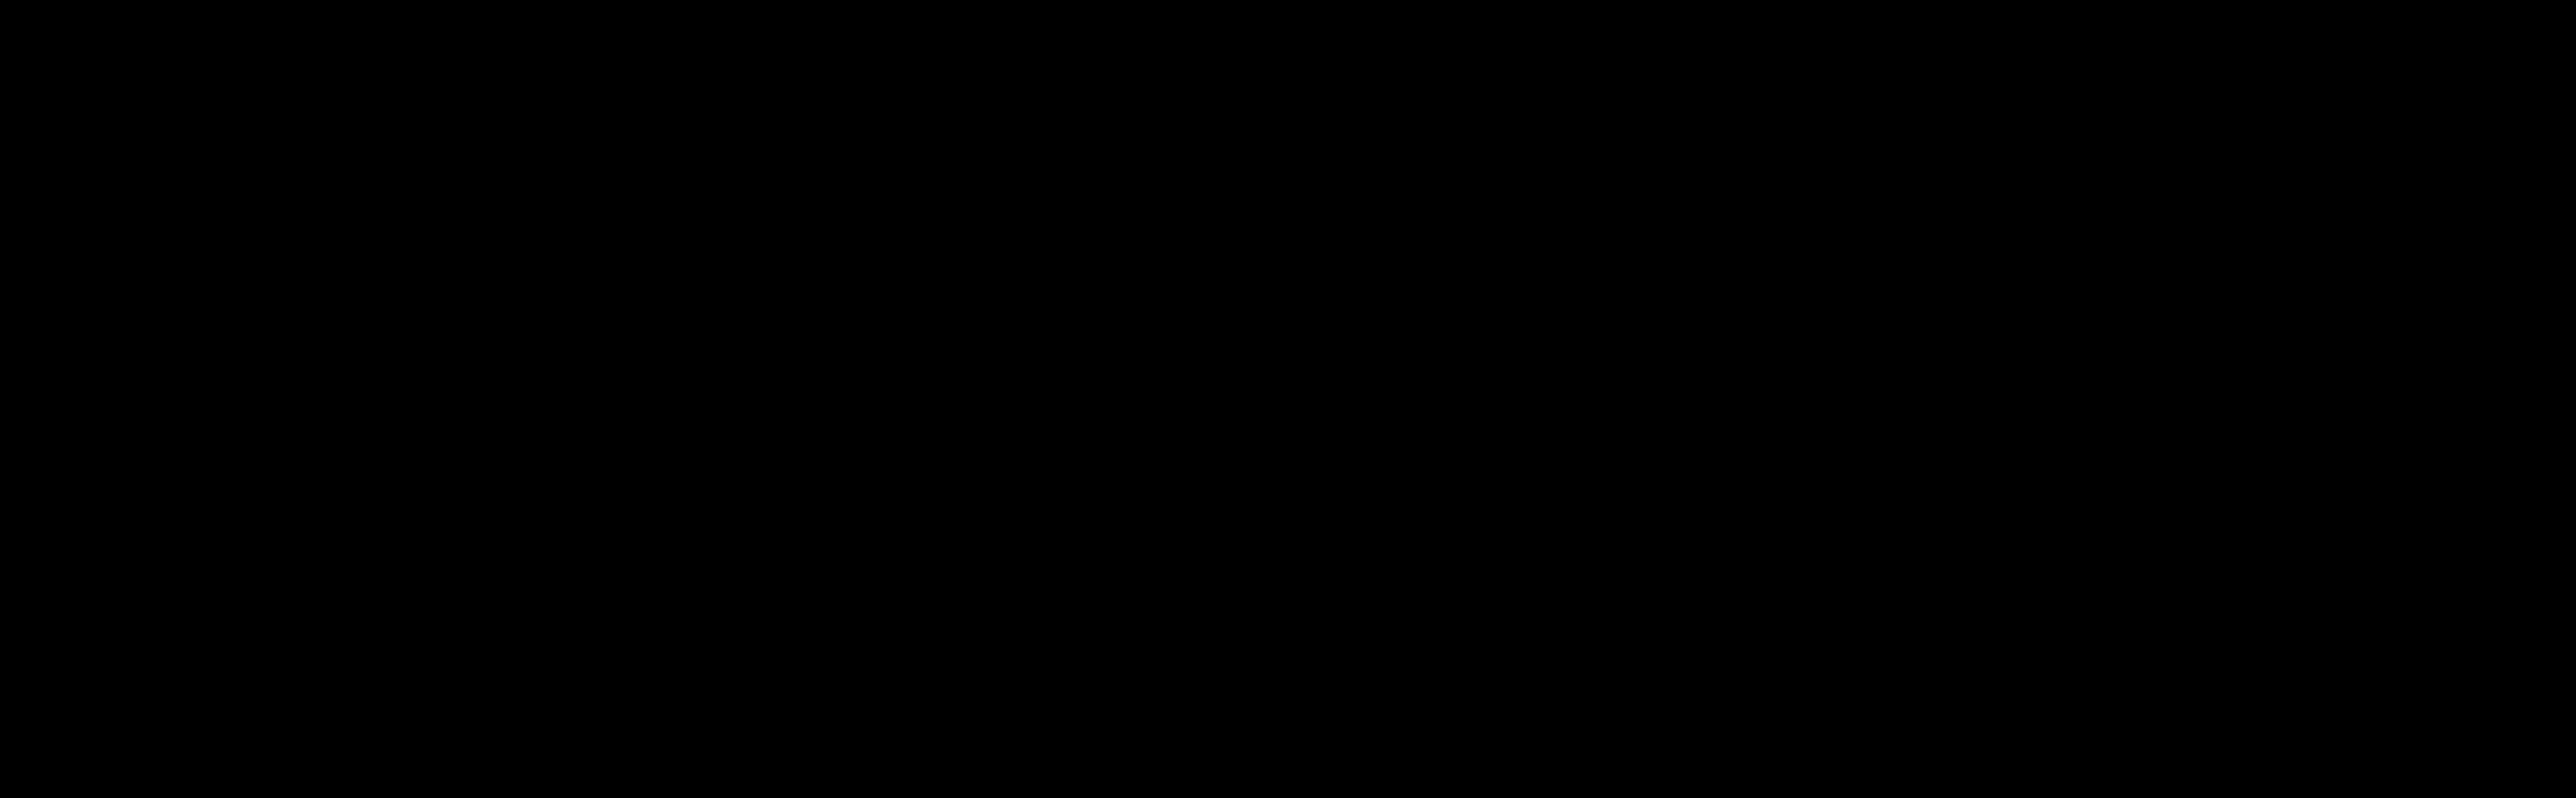 Daclatasvir-d<sub>6</sub>